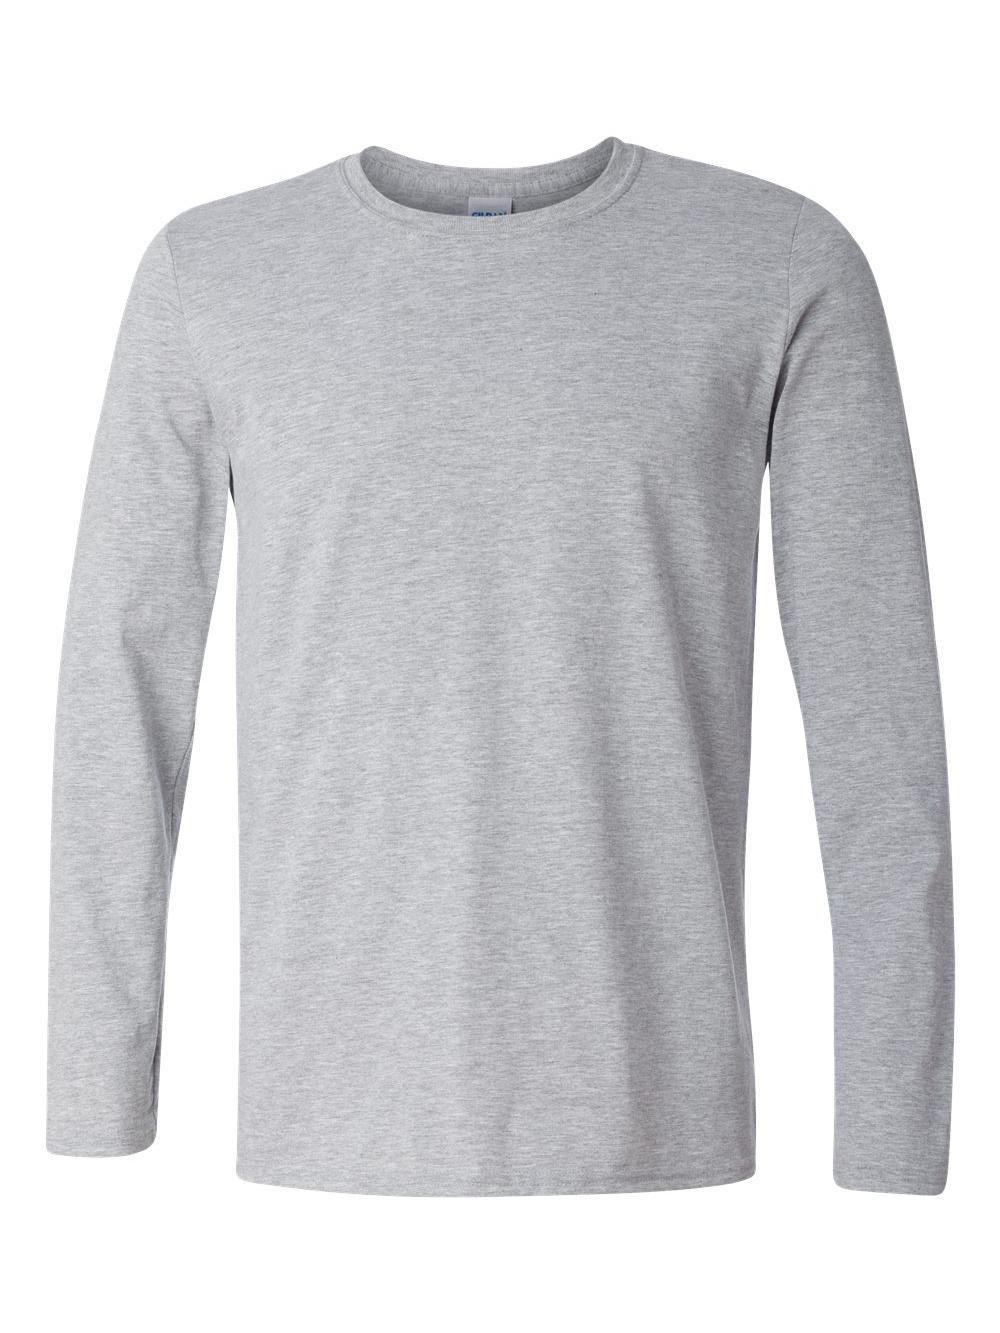 Gildan-Softstyle-Long-Sleeve-T-Shirt-64400 thumbnail 18